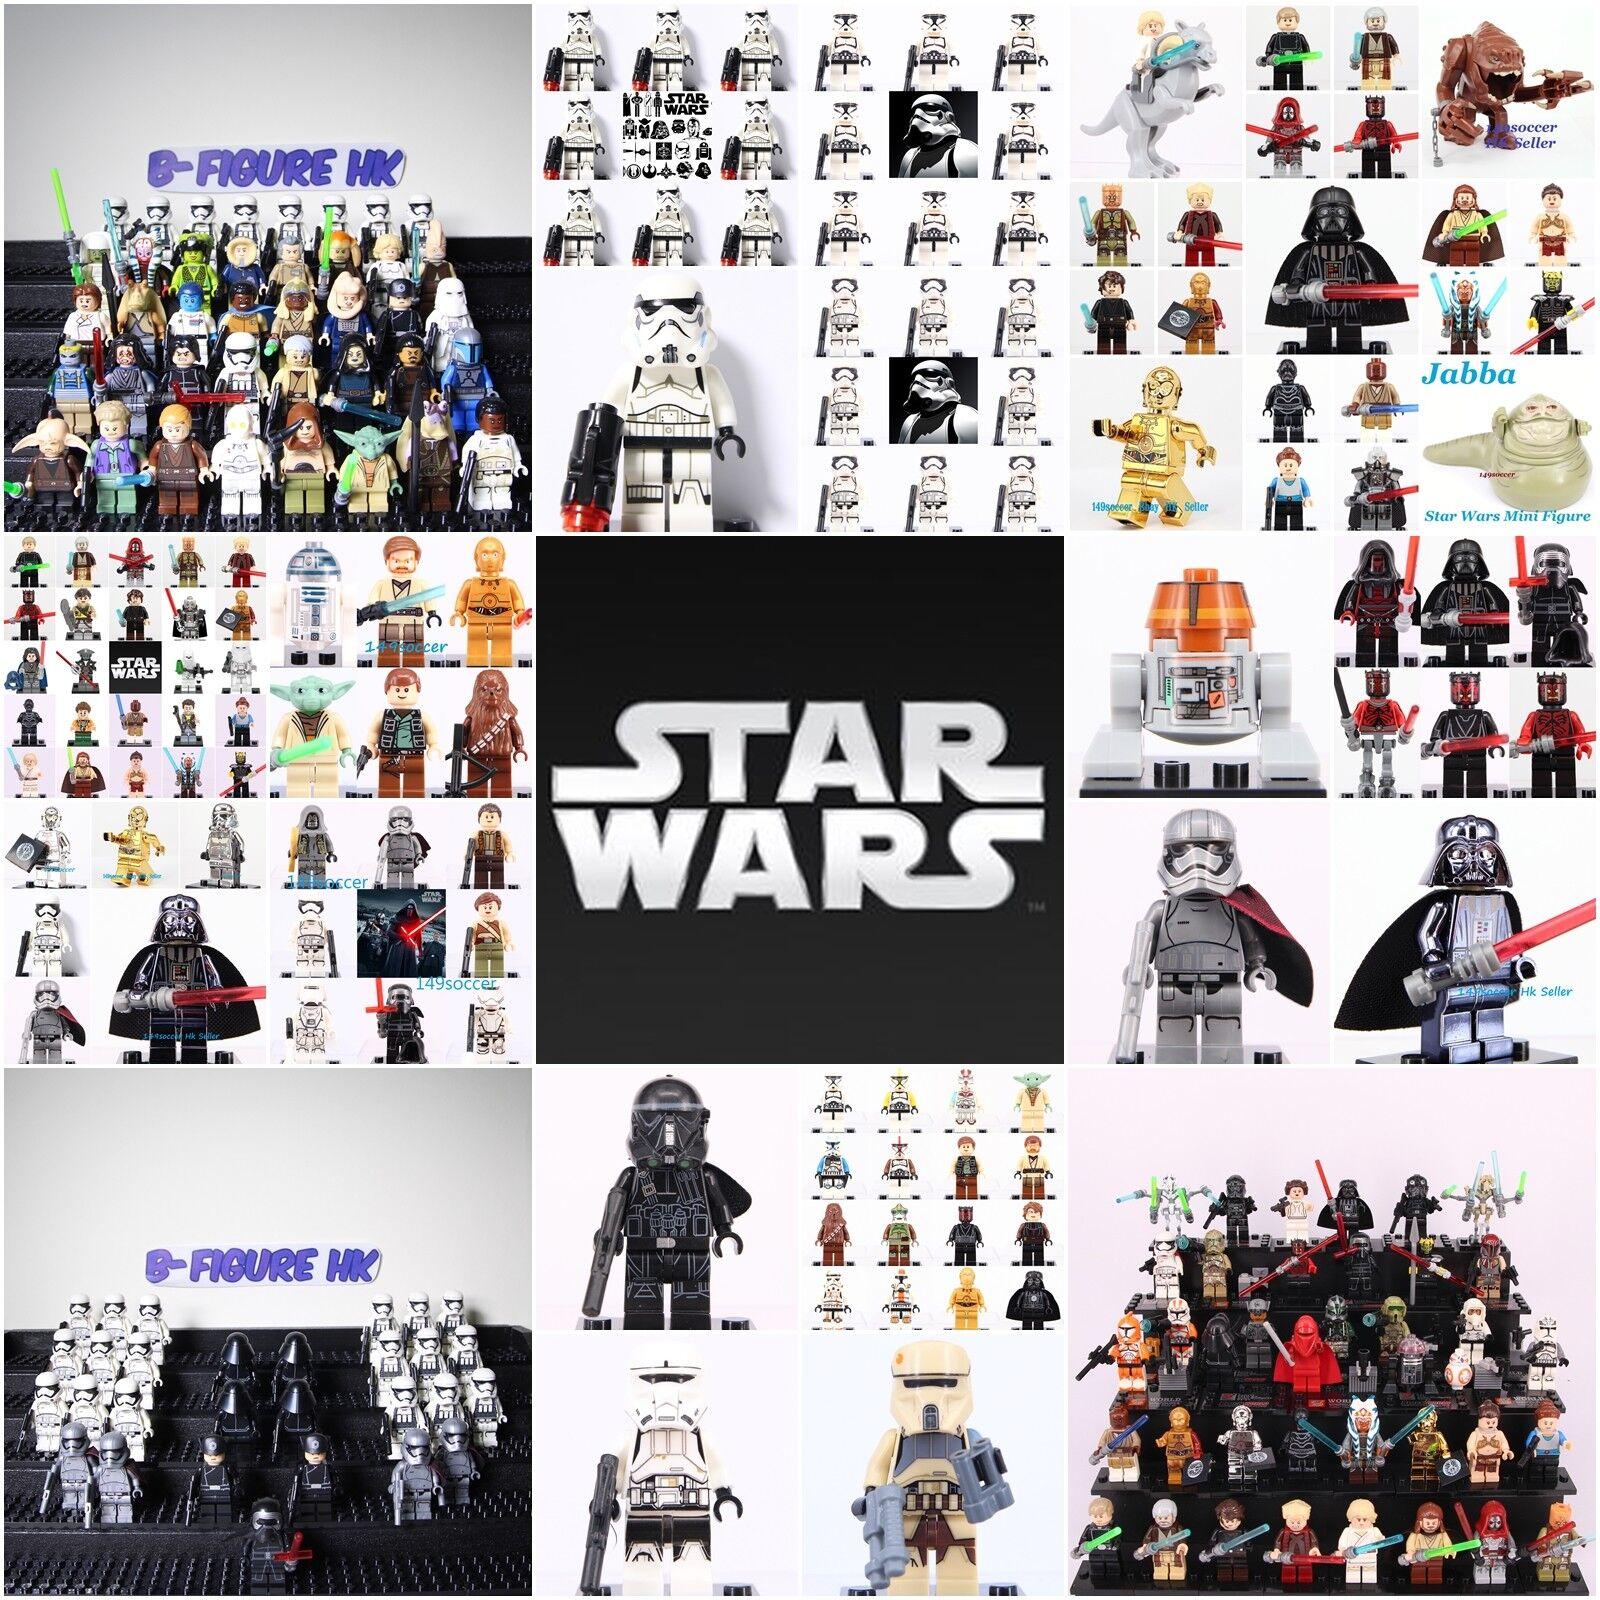 All New Star Wars Superhero The last jedi Mini figure Set Fit Lego minifigures